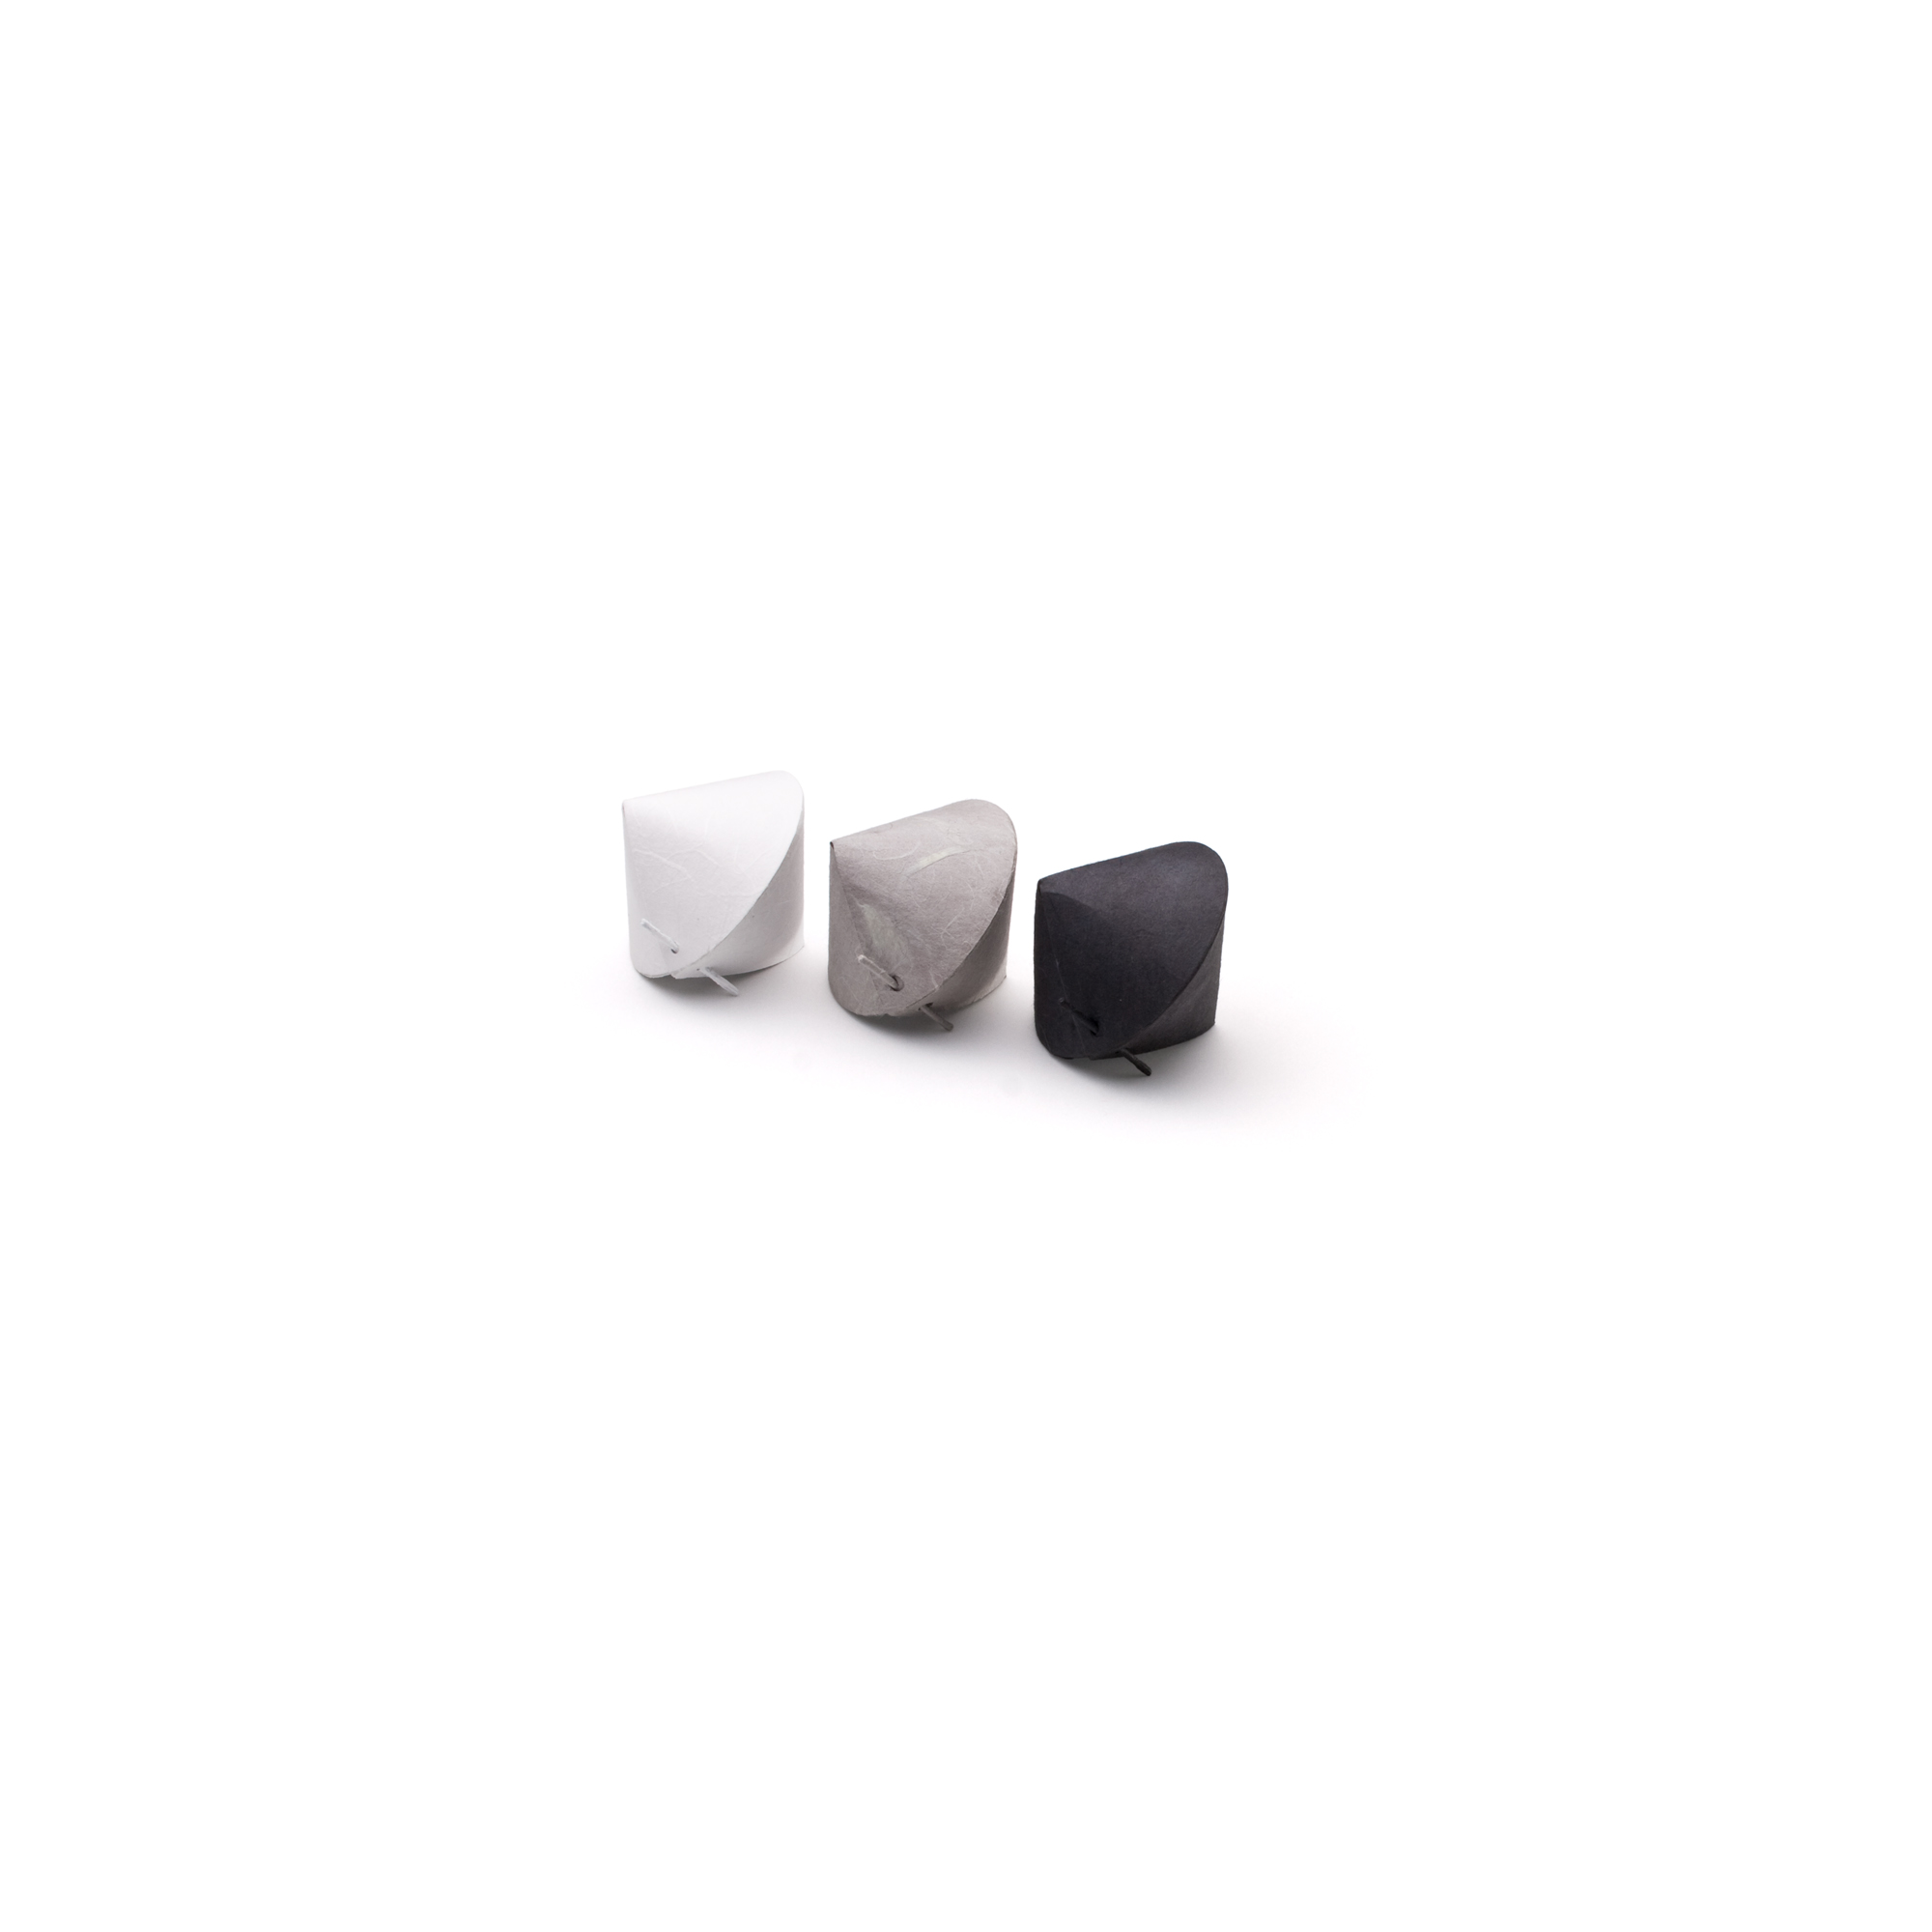 PACBOX standard black/white/grey